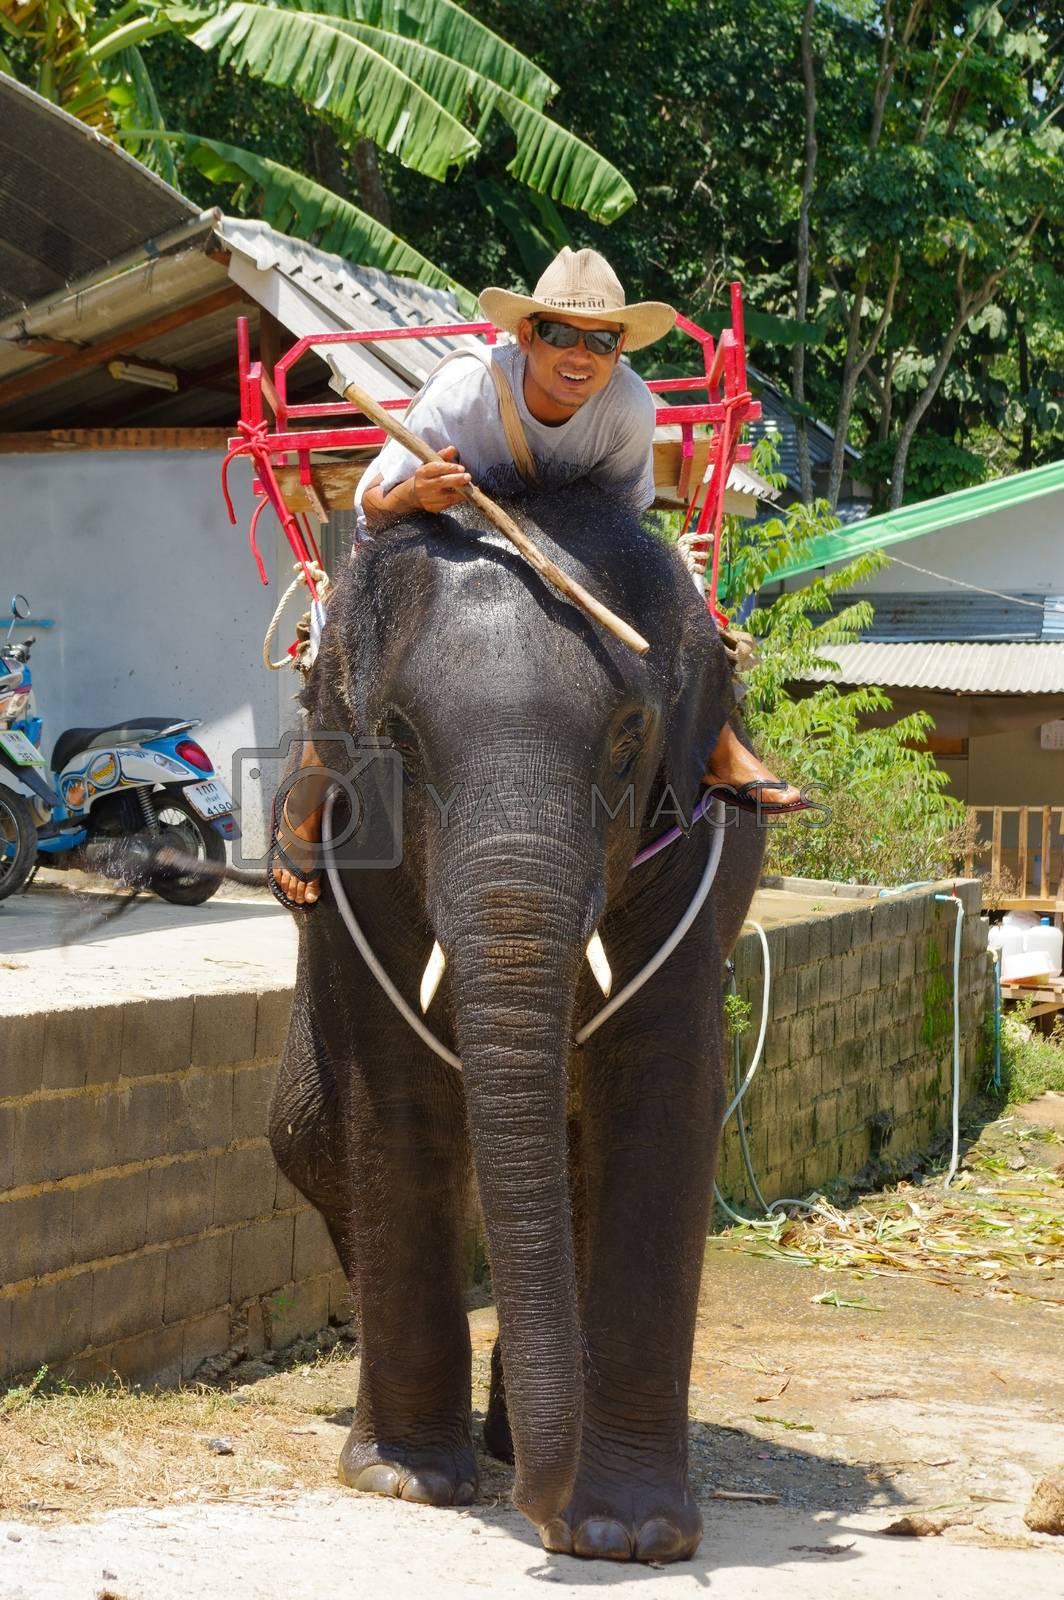 a man riding on elephant on Phuket Island in Thailand